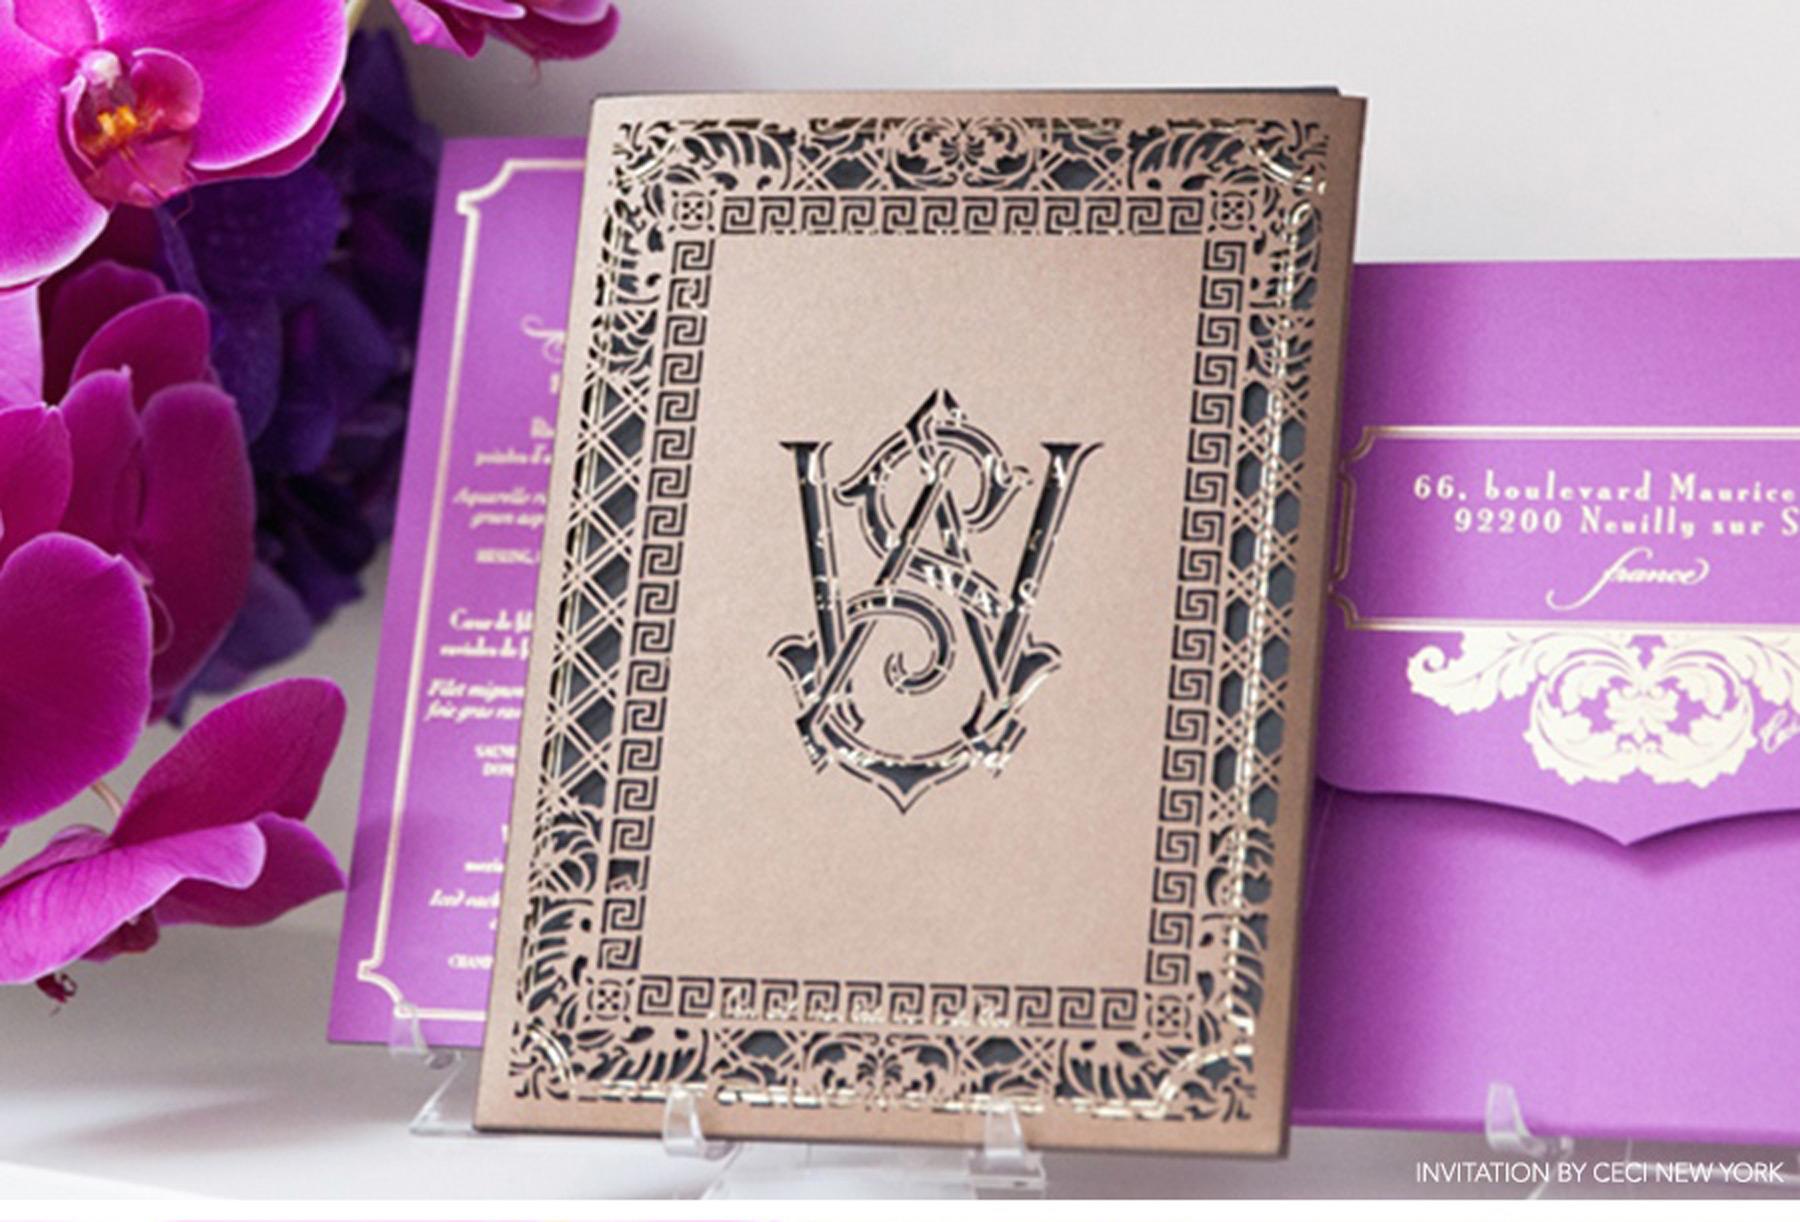 Luxury Wedding Invitations Online: Paris Luxury Wedding: Lucas & Thierry